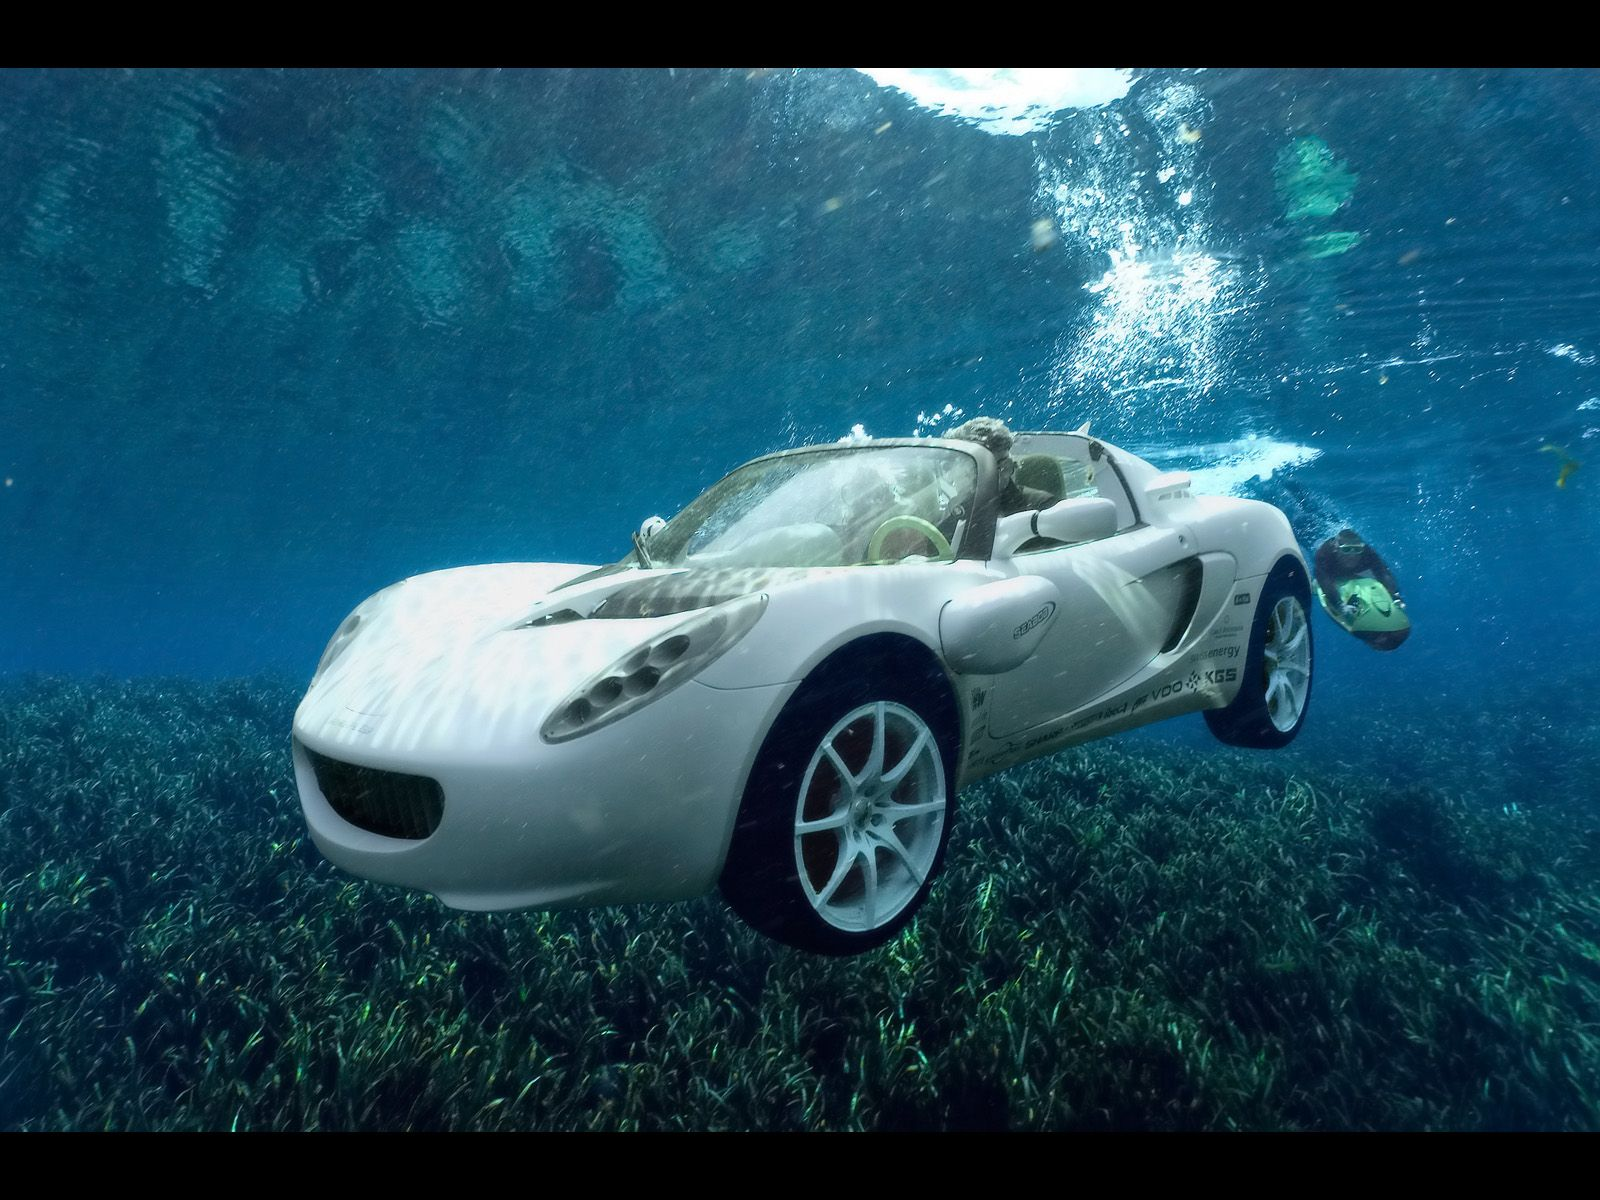 Rinspeed Squba Lotus Elise Modified Submarine Bond Cars Concept Cars Underwater